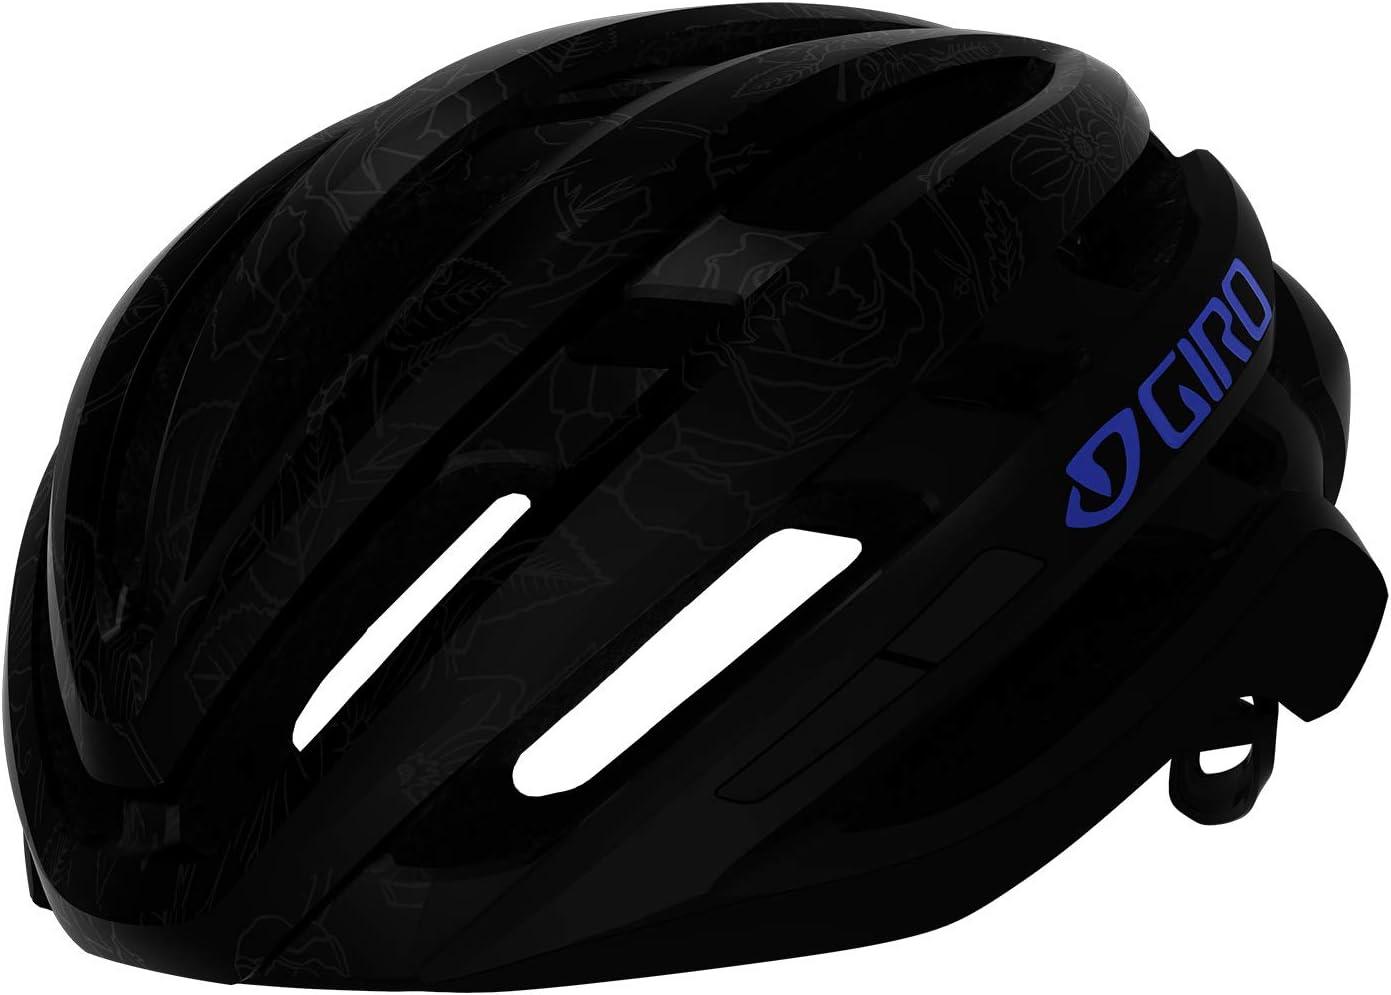 Giro Agilis MIPS W Womens Road Cycling Helmet